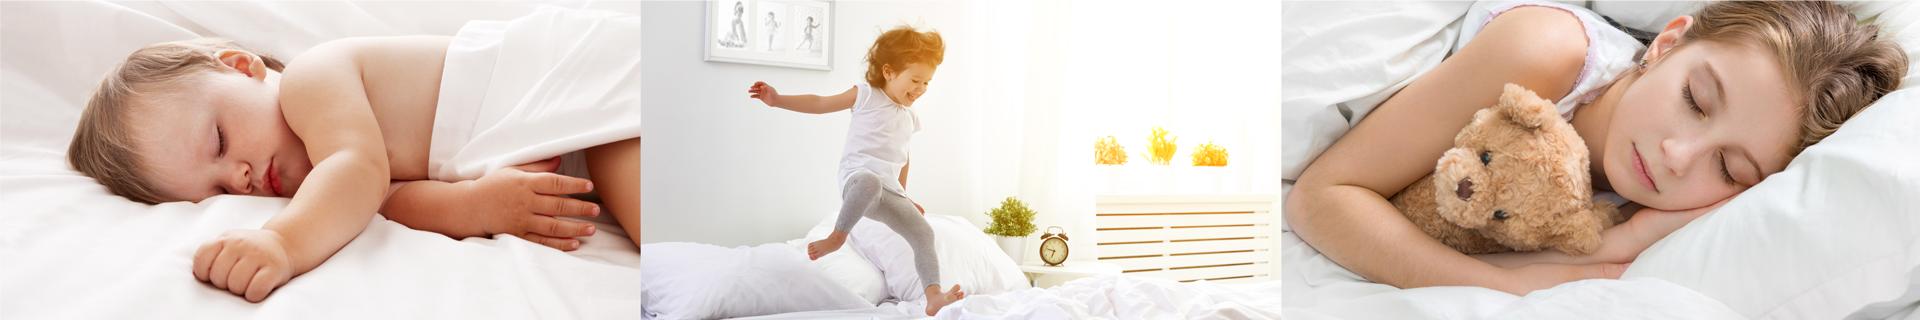 Materace dla dzieci, materac dla dziecka – My Sweet Room